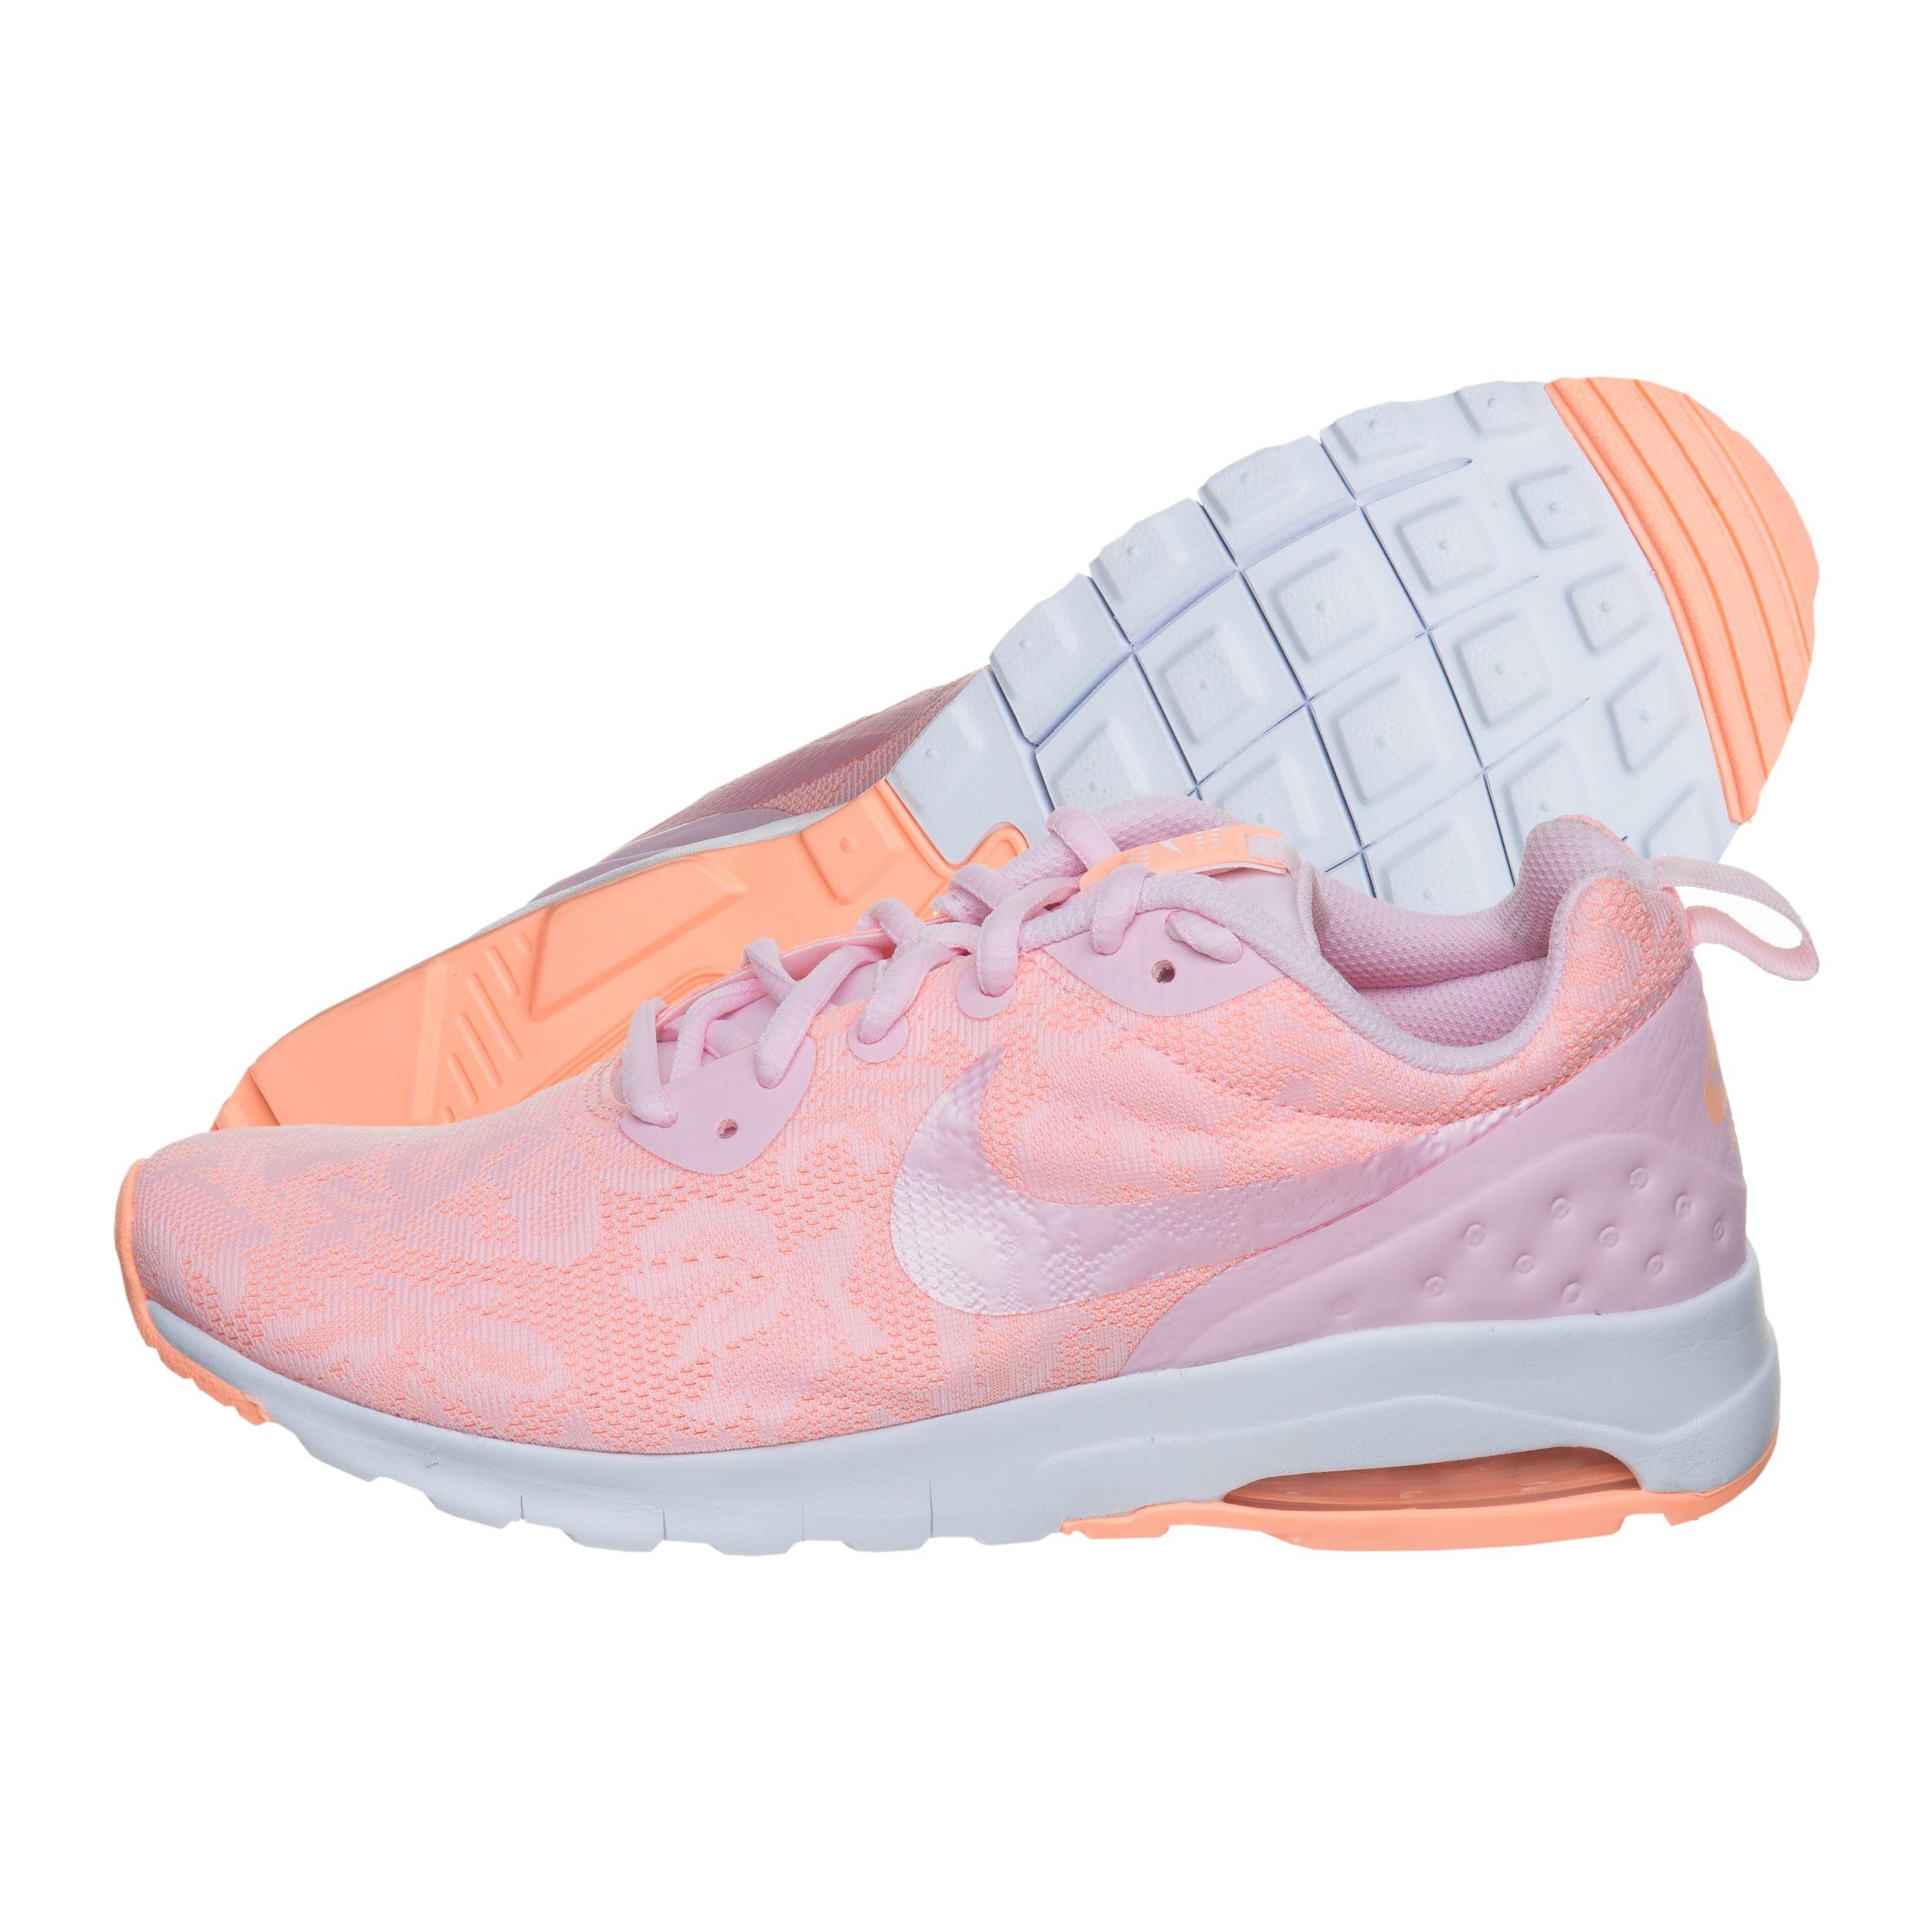 eeda0ab252 Teamsport Philipp | Nike WMNS Air Max Motion Low ENG Damen 37,5 ...